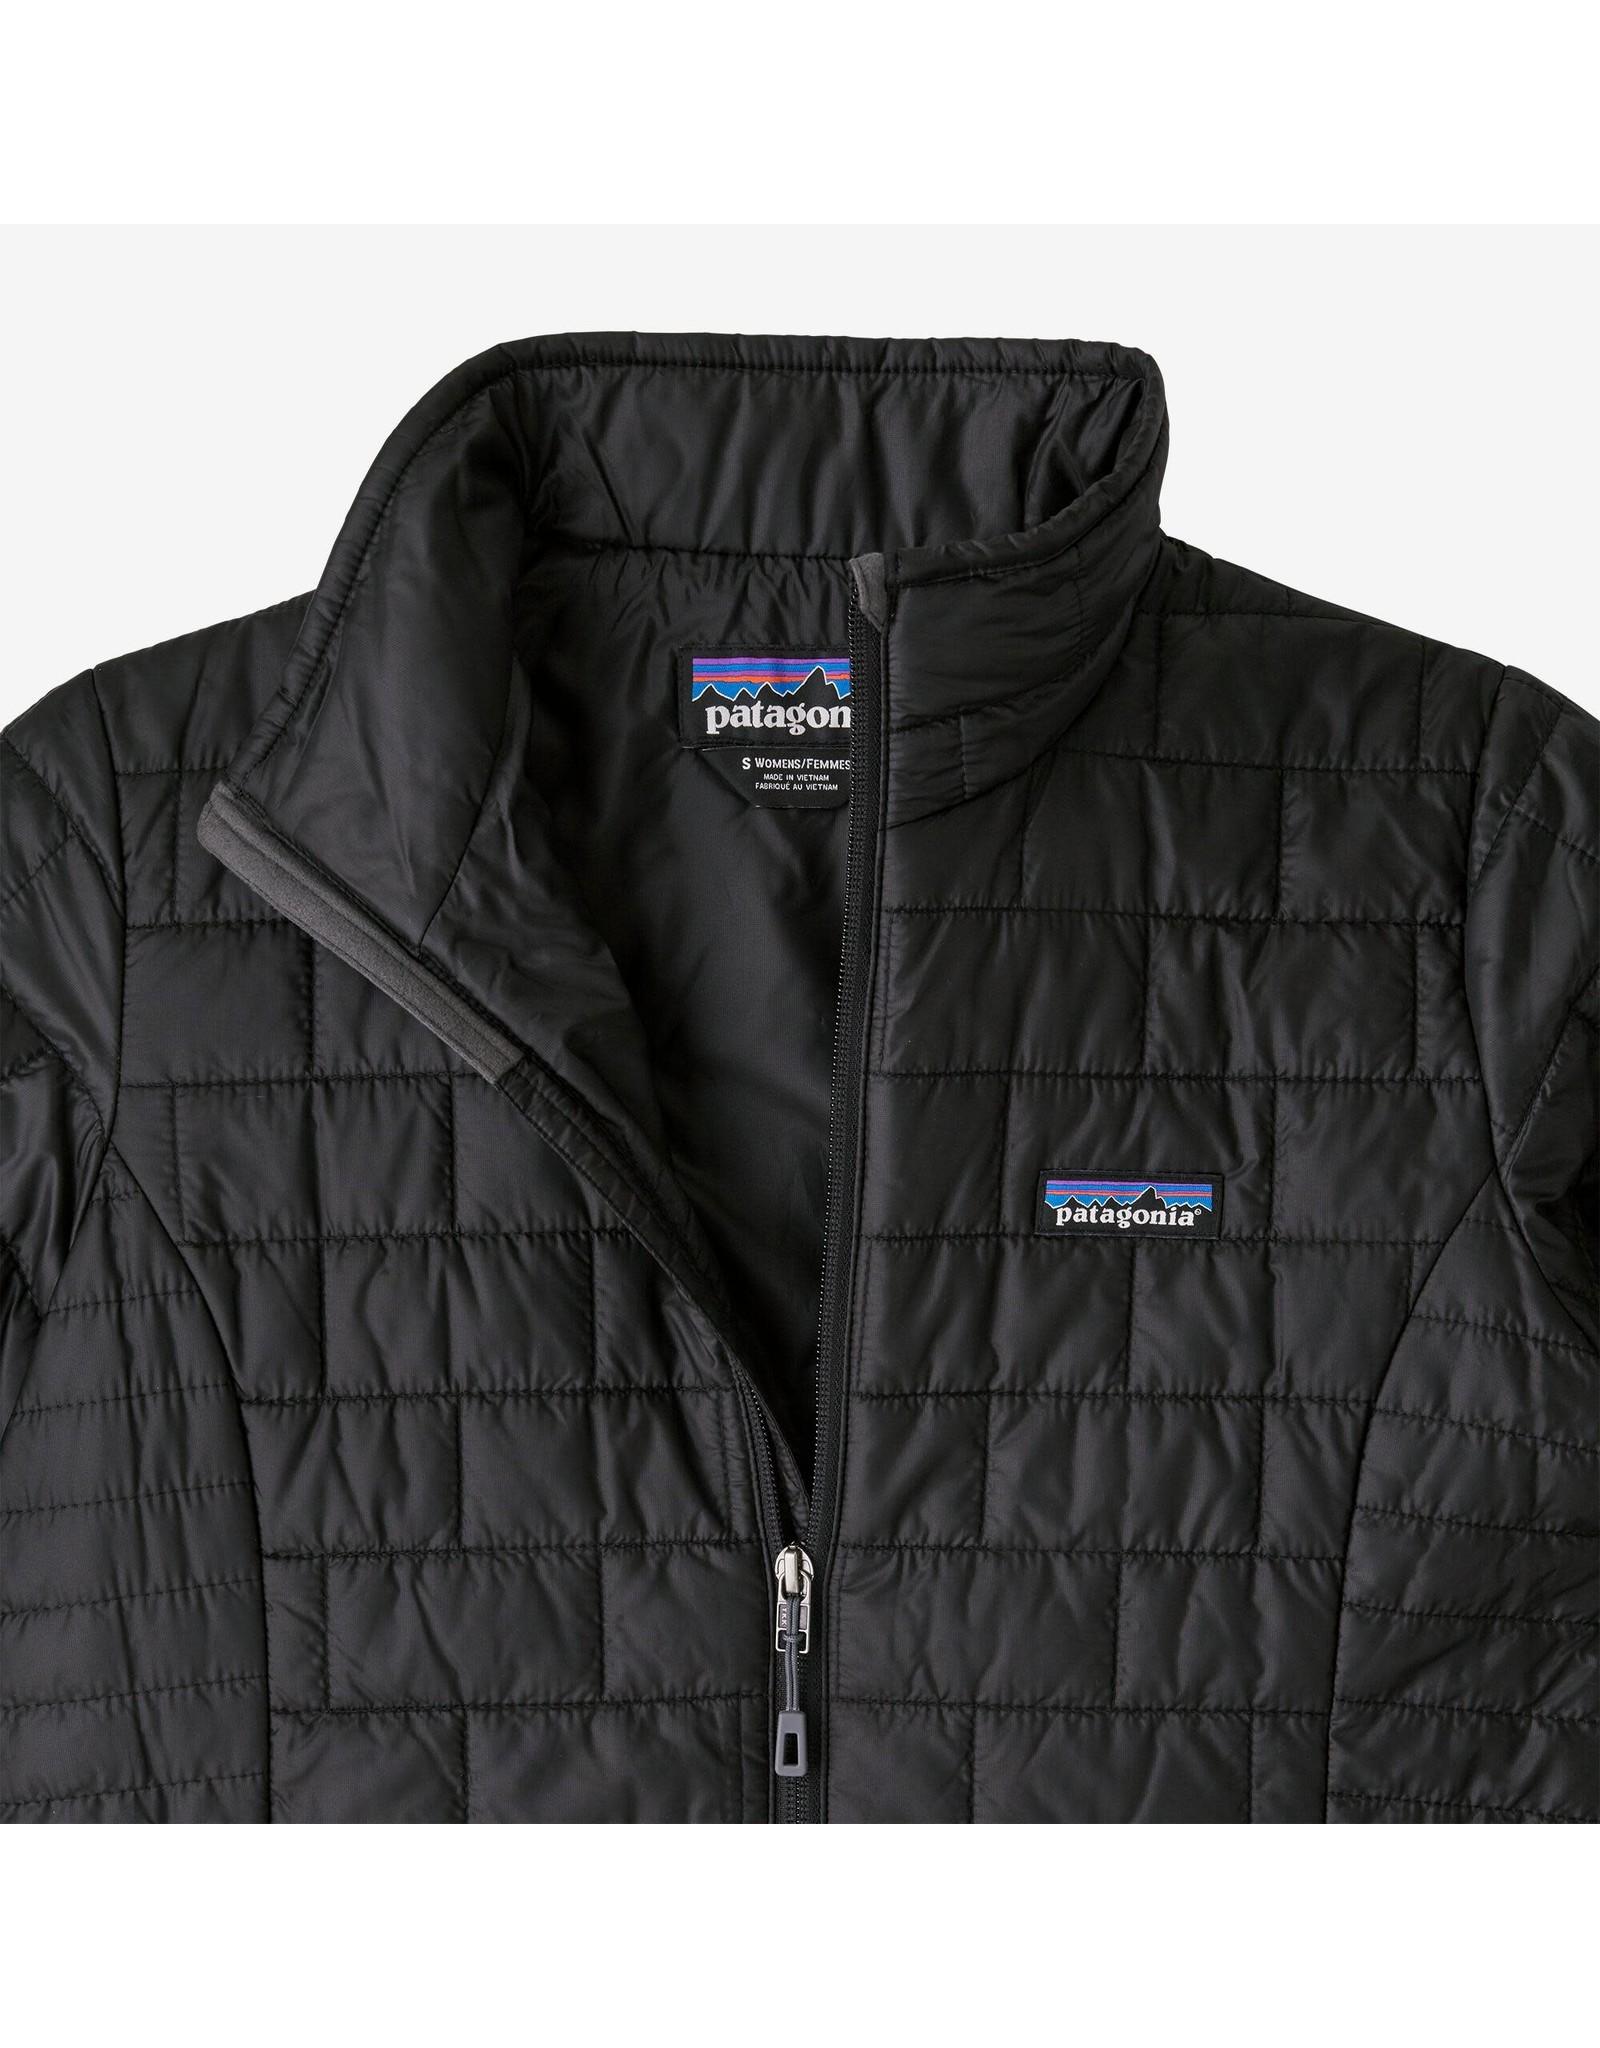 Patagonia Women's Nano Puff Jacket